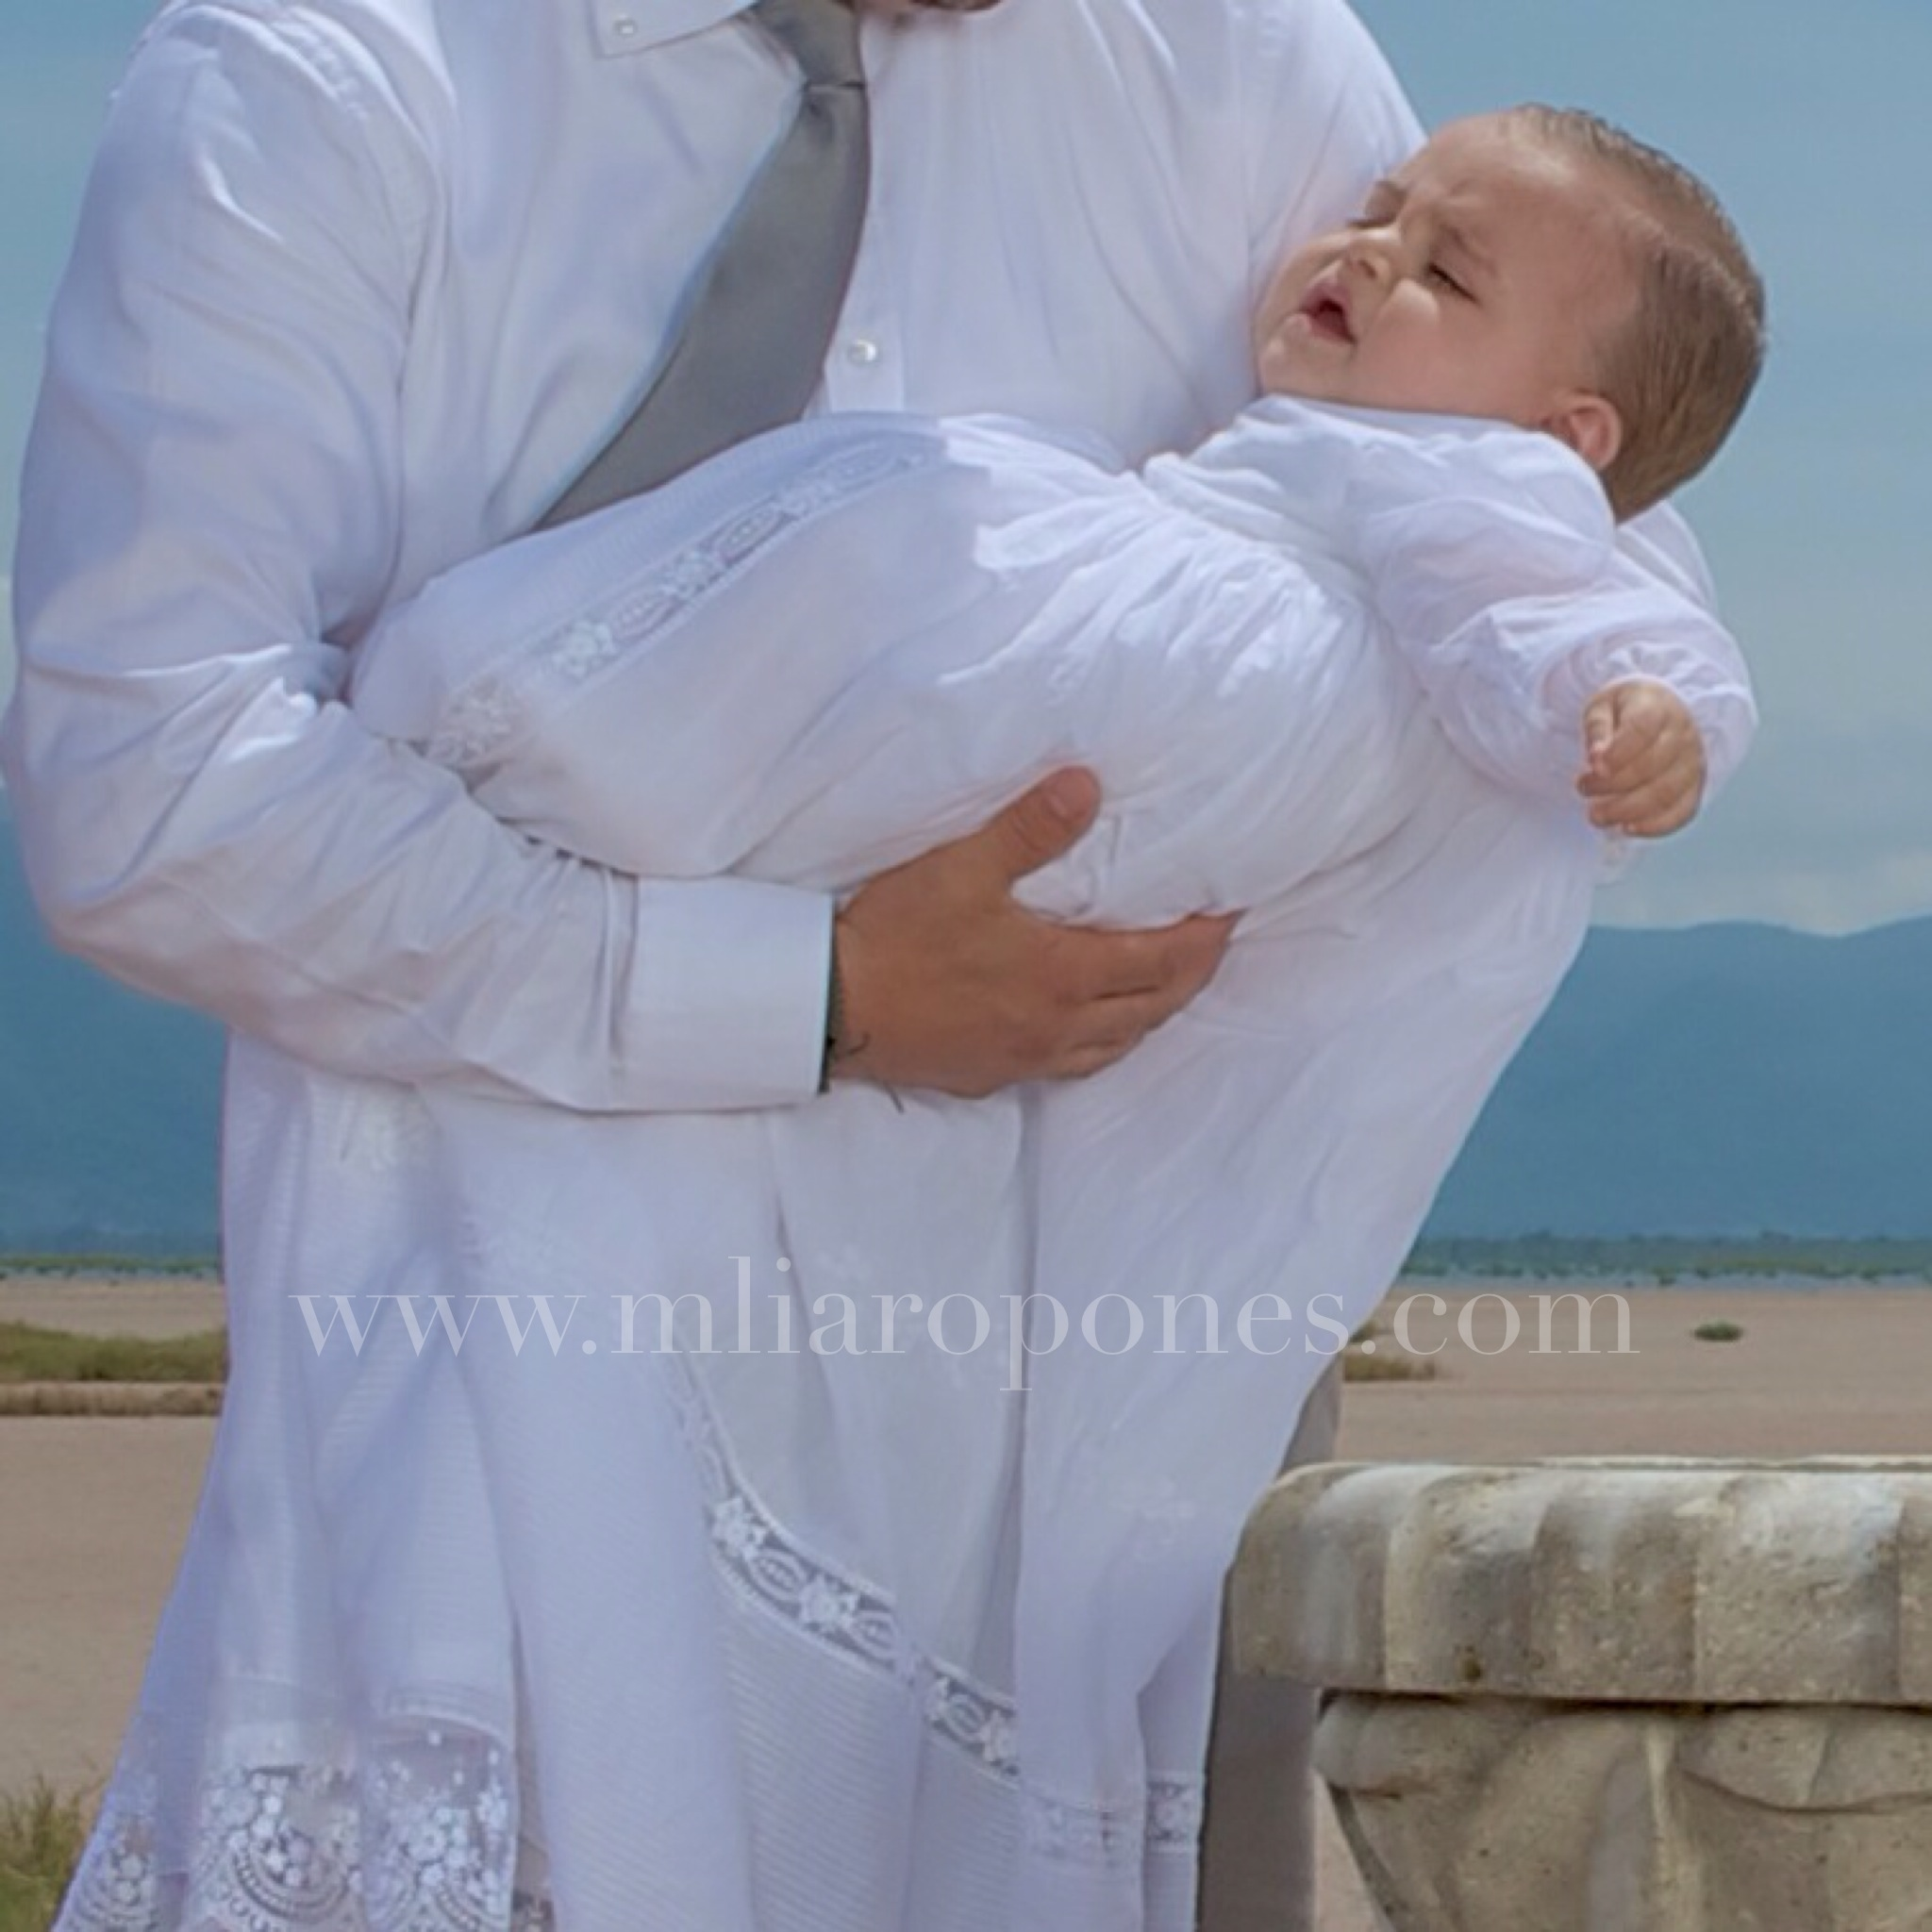 Ajuar para bautizo